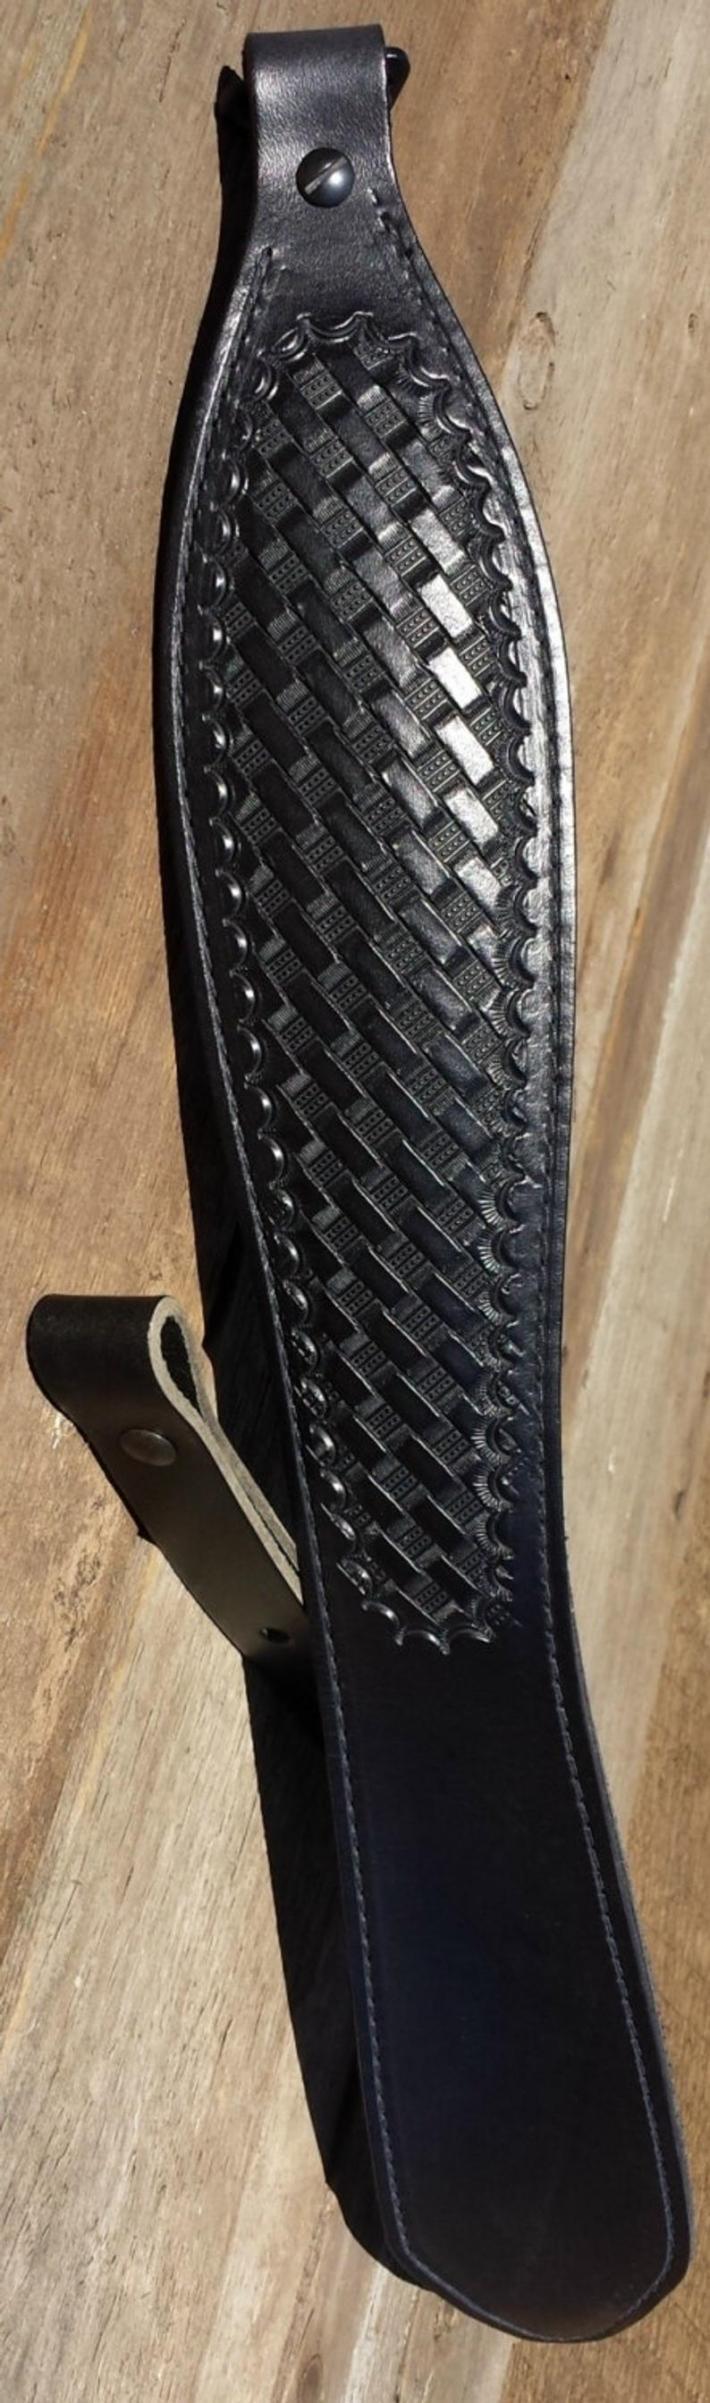 Hand Tooled Black Rifle Sling Basket Weave